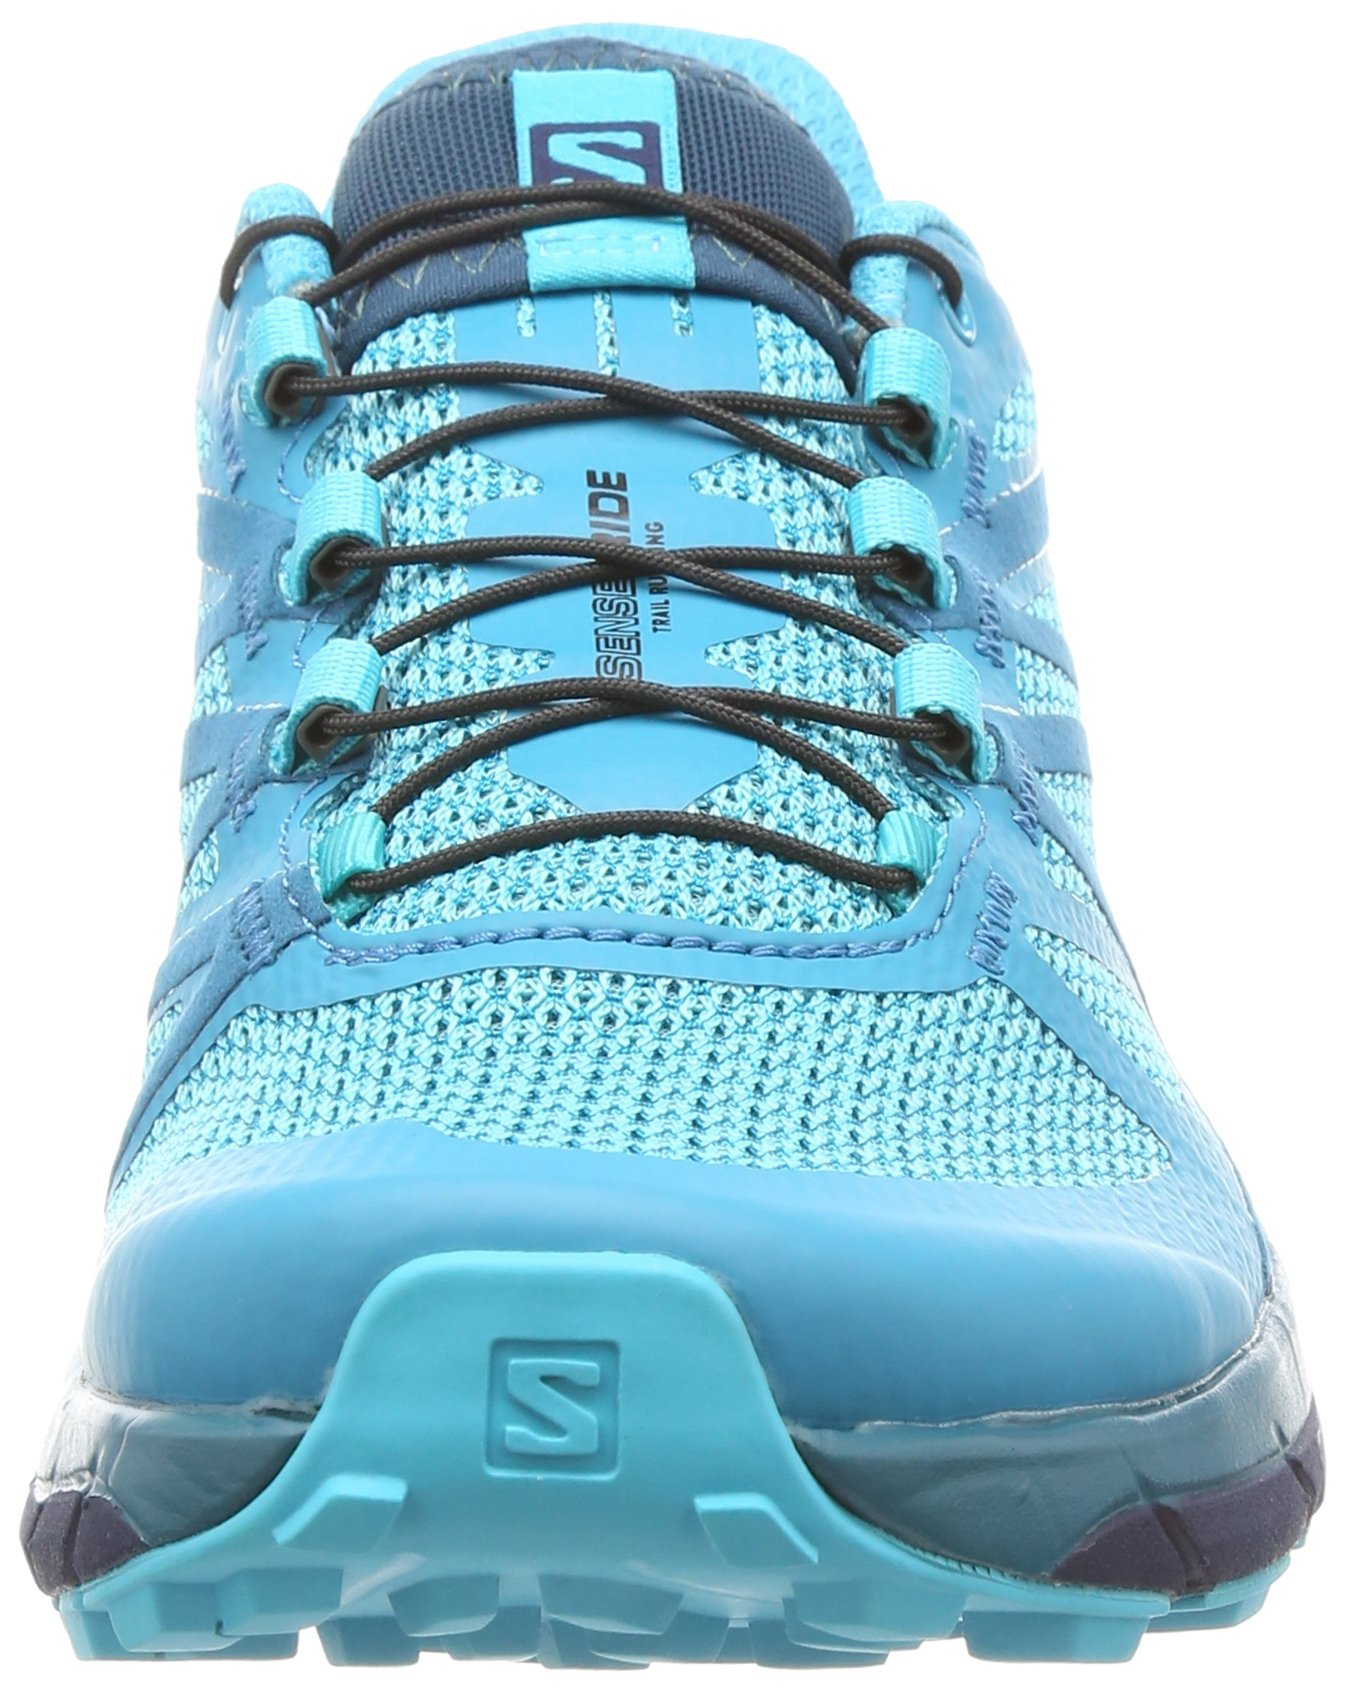 Salomon Sense Ride Running Shoe - Women's Blue Bird/Deep Lagoon/Navy Blazer 7 by Salomon (Image #4)